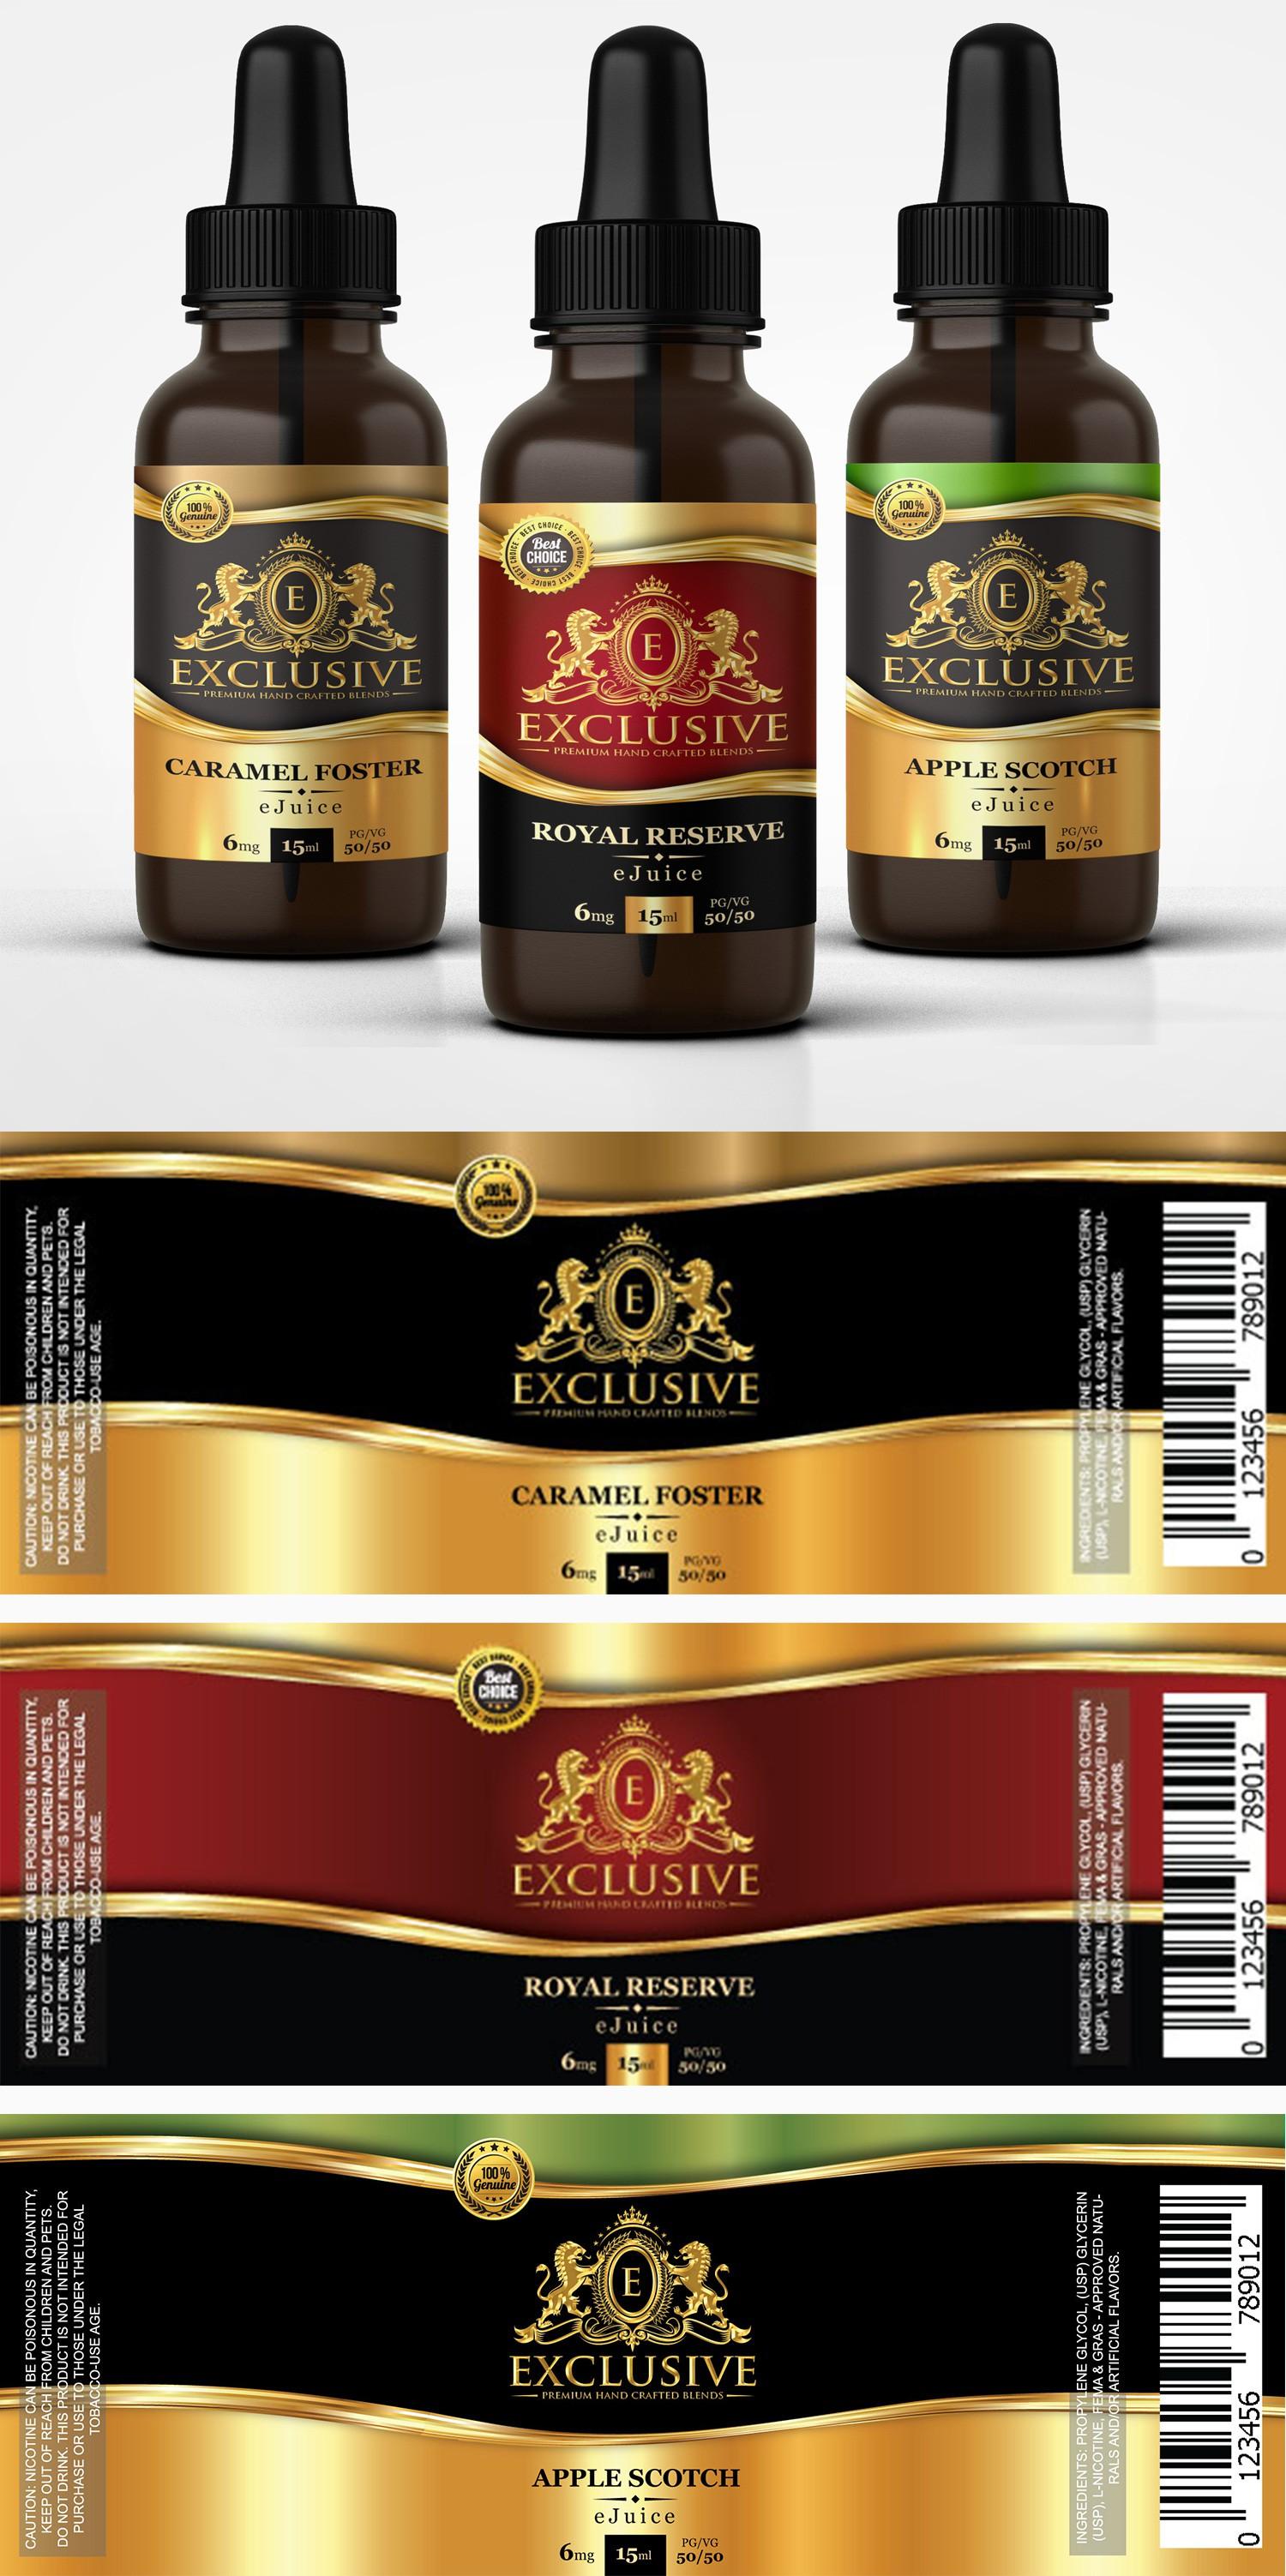 design label for up and coming premium E liquid company